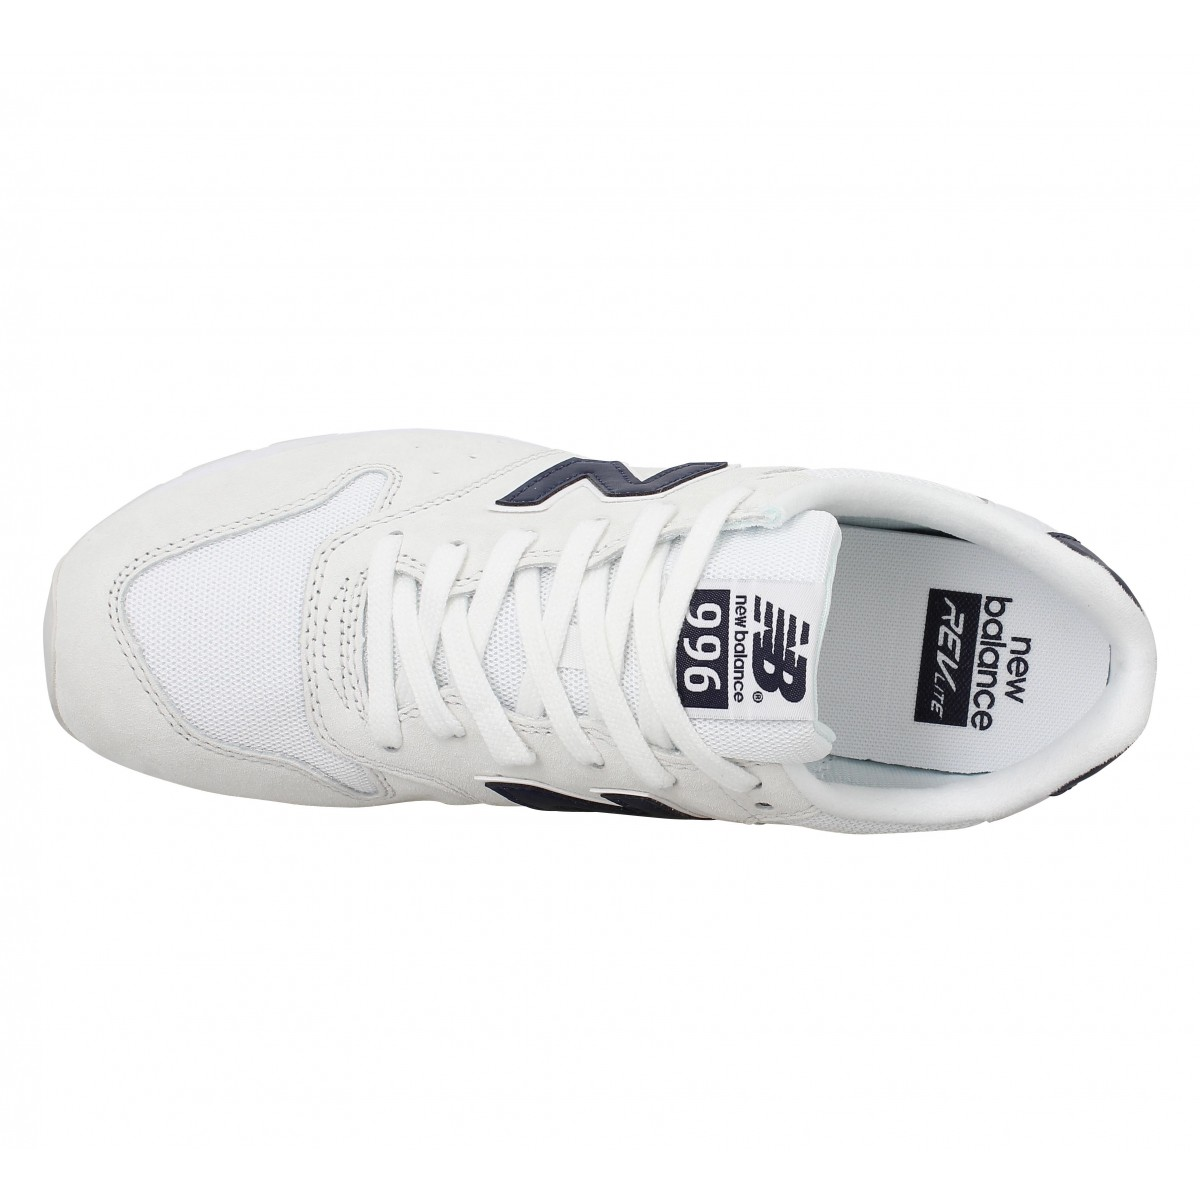 New balance mrl 996 blanc marine homme   Fanny chaussures